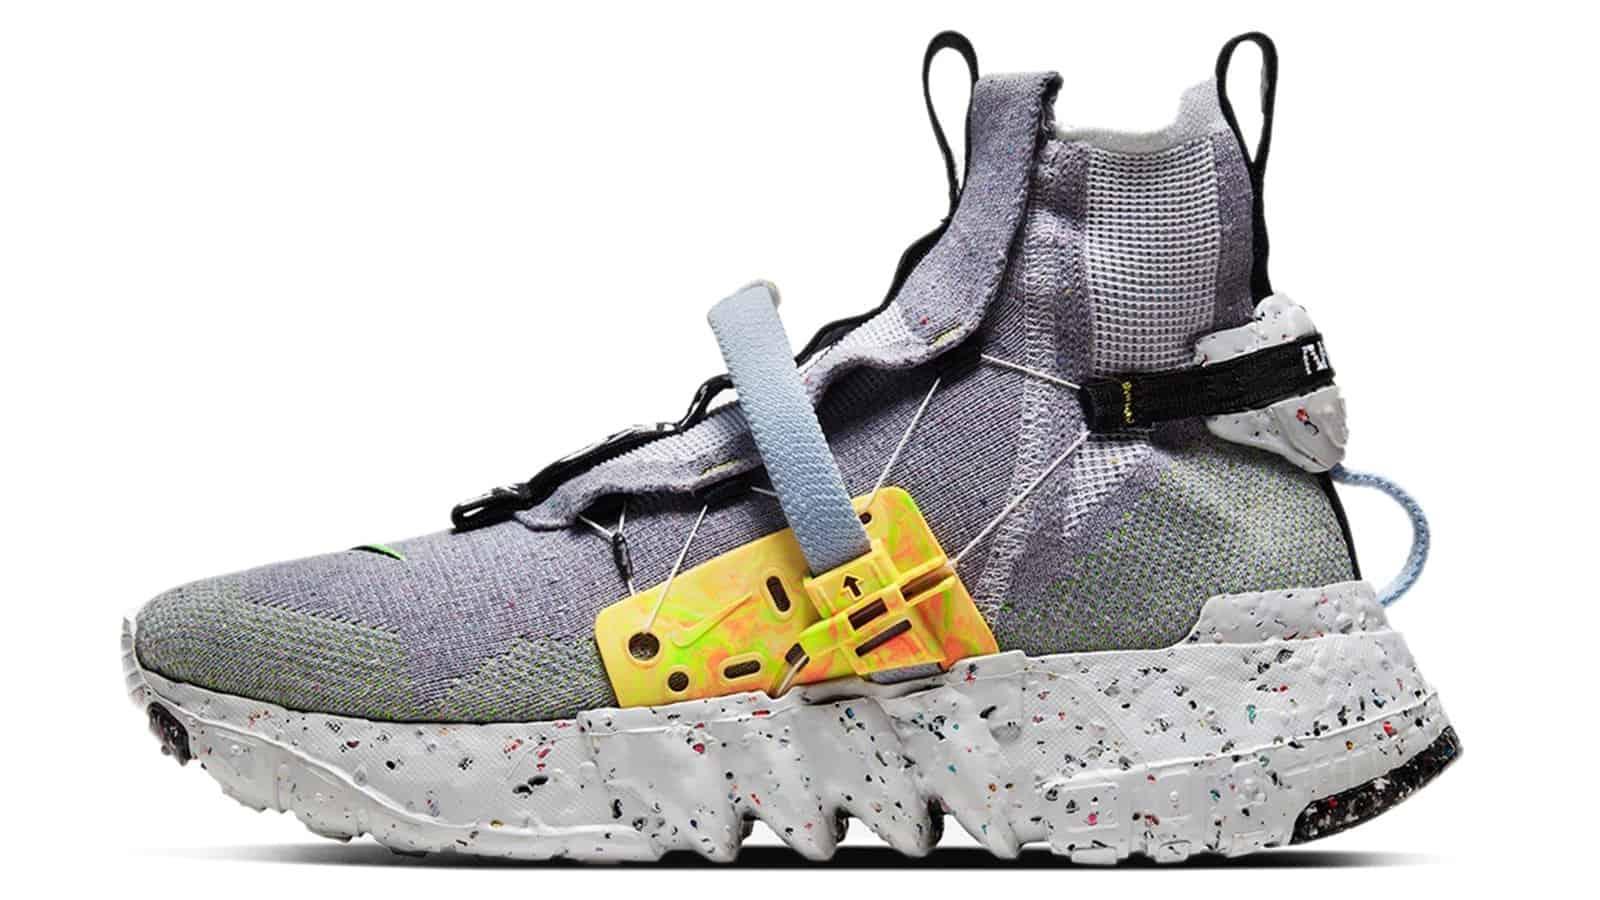 Nike Space Hippie 03 Volt 'This Is Trash' CQ3989-002